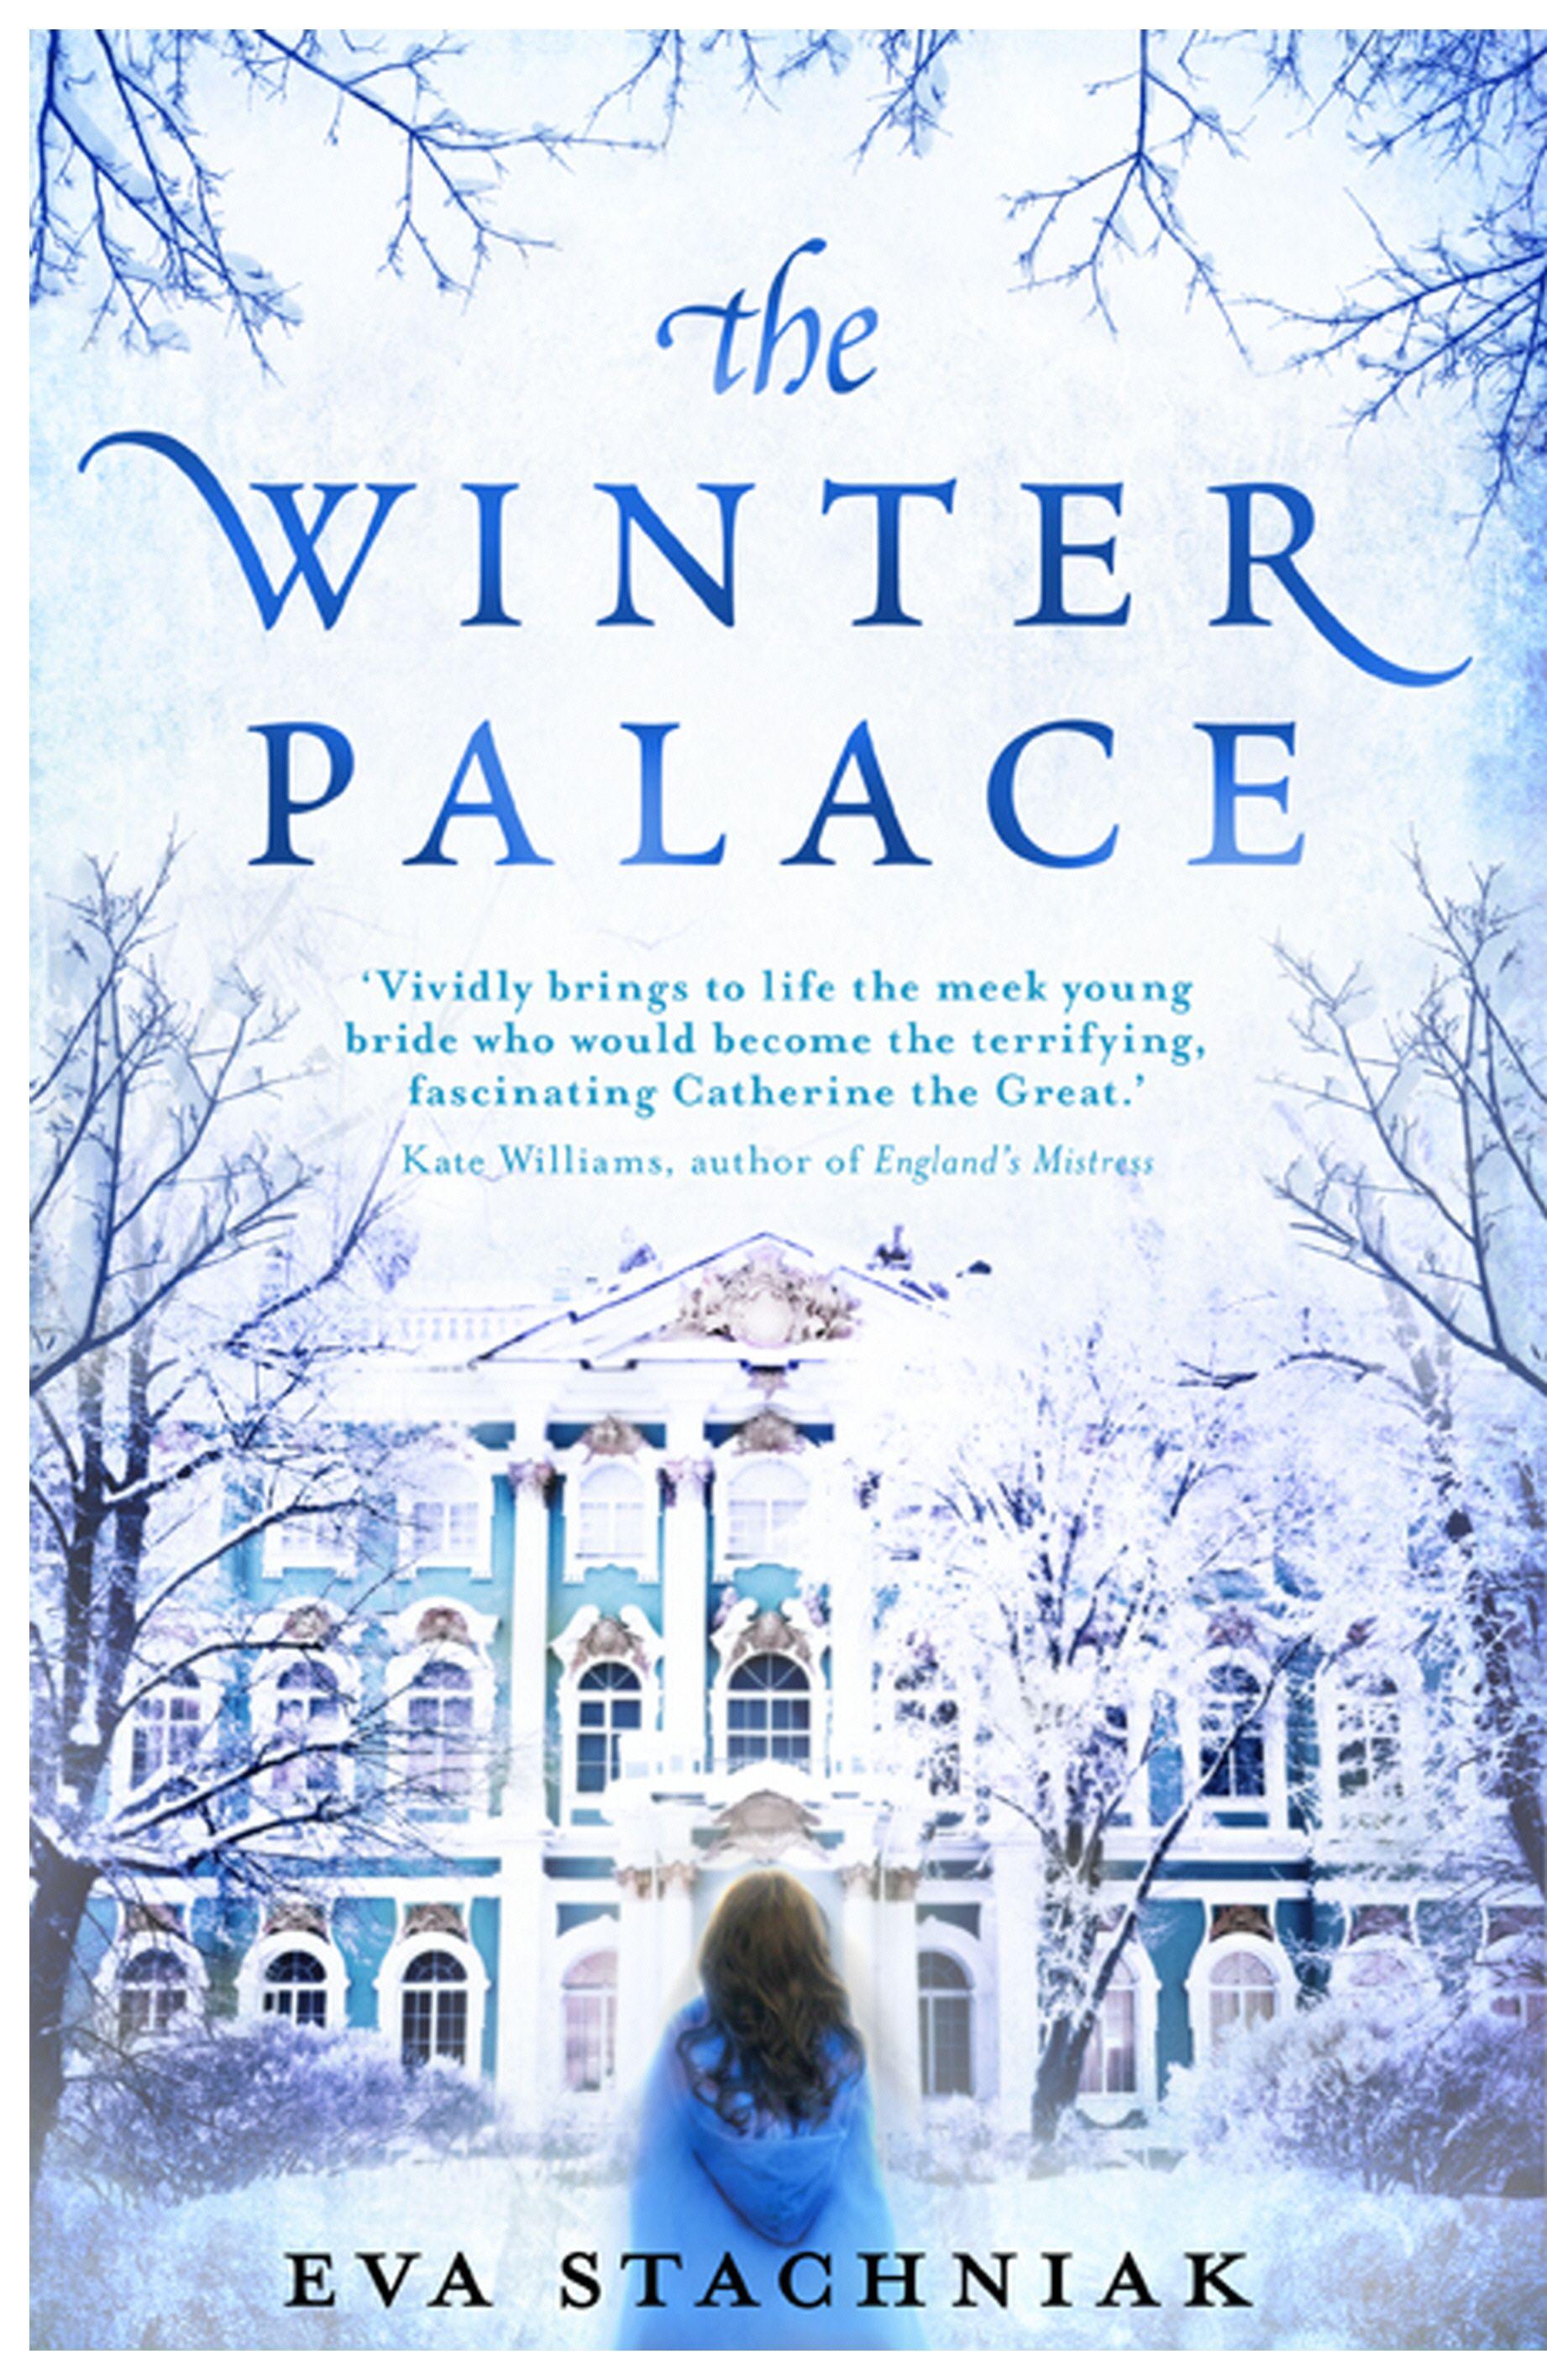 The Winter Palace by Eva Stachniak | Catherine the great, Winter palace, Historical novels